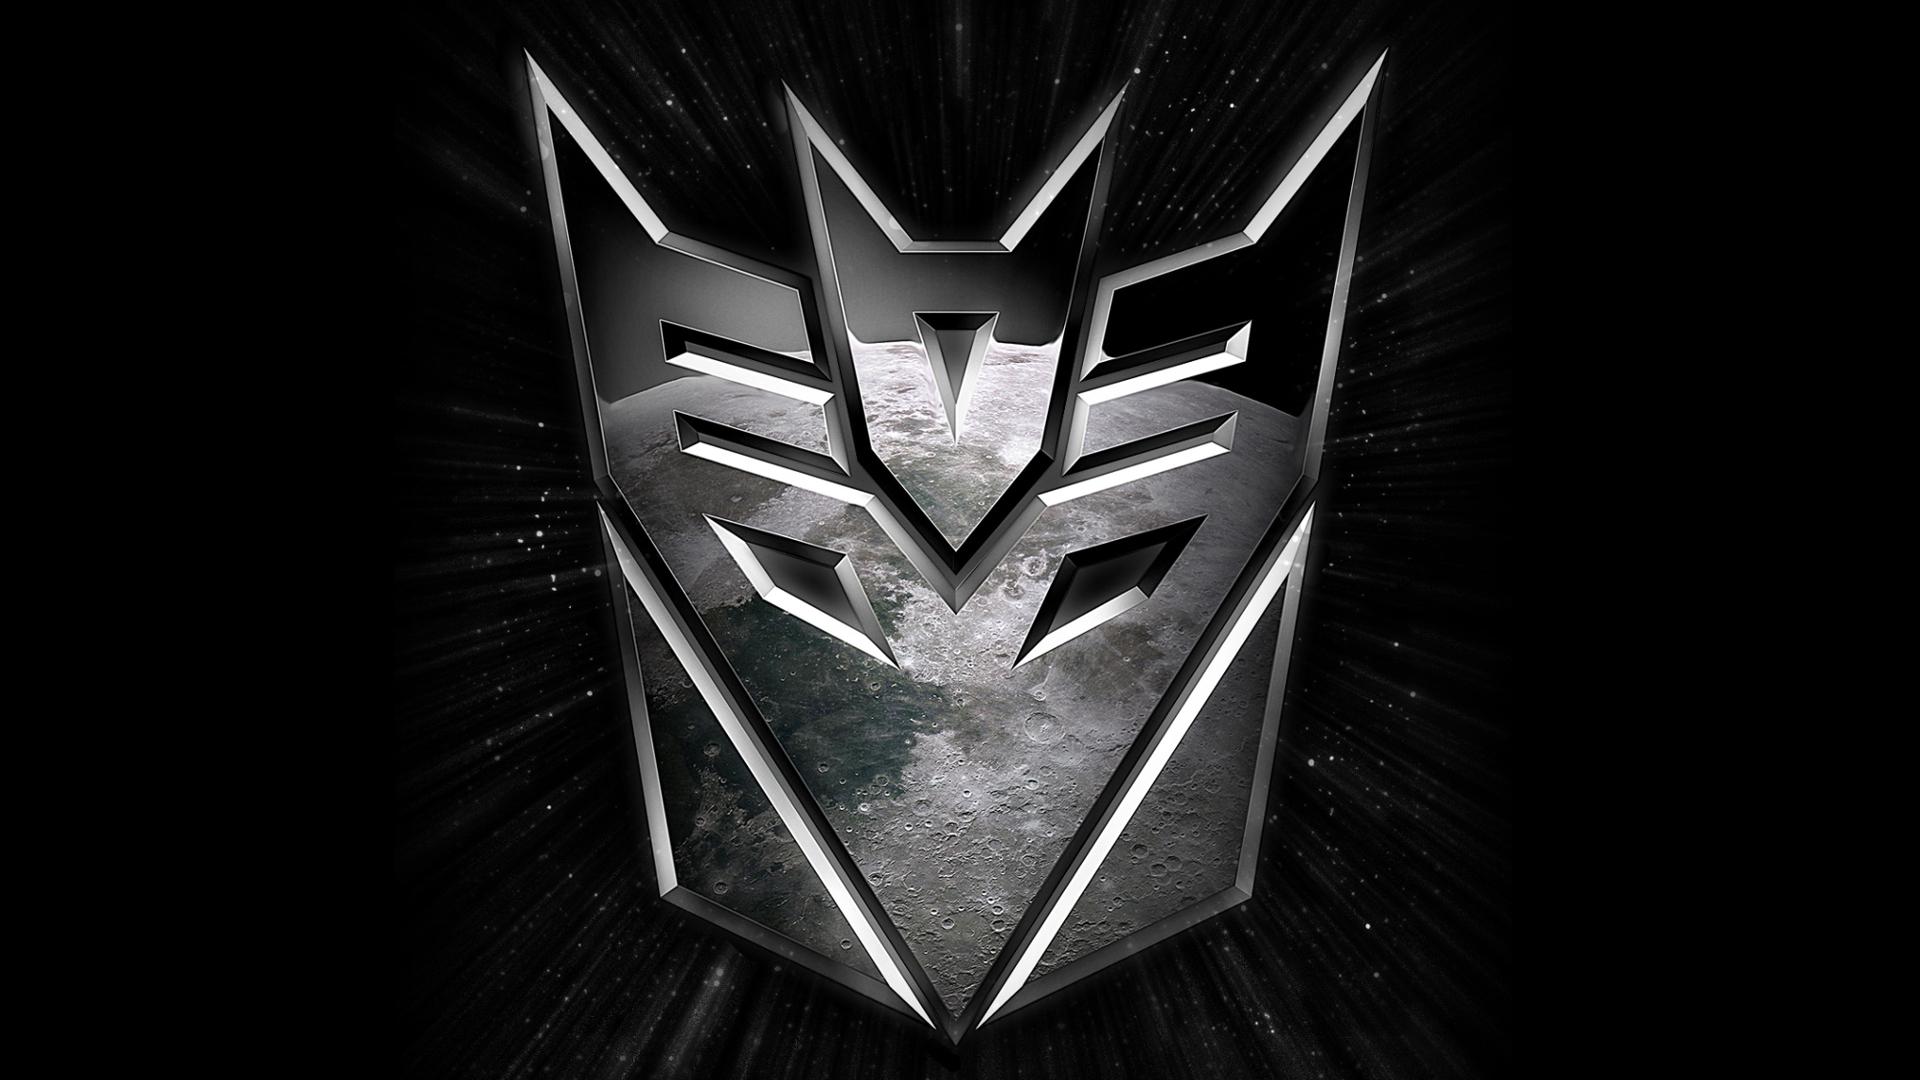 Transformers Wallpaper Autobots And Decepticons